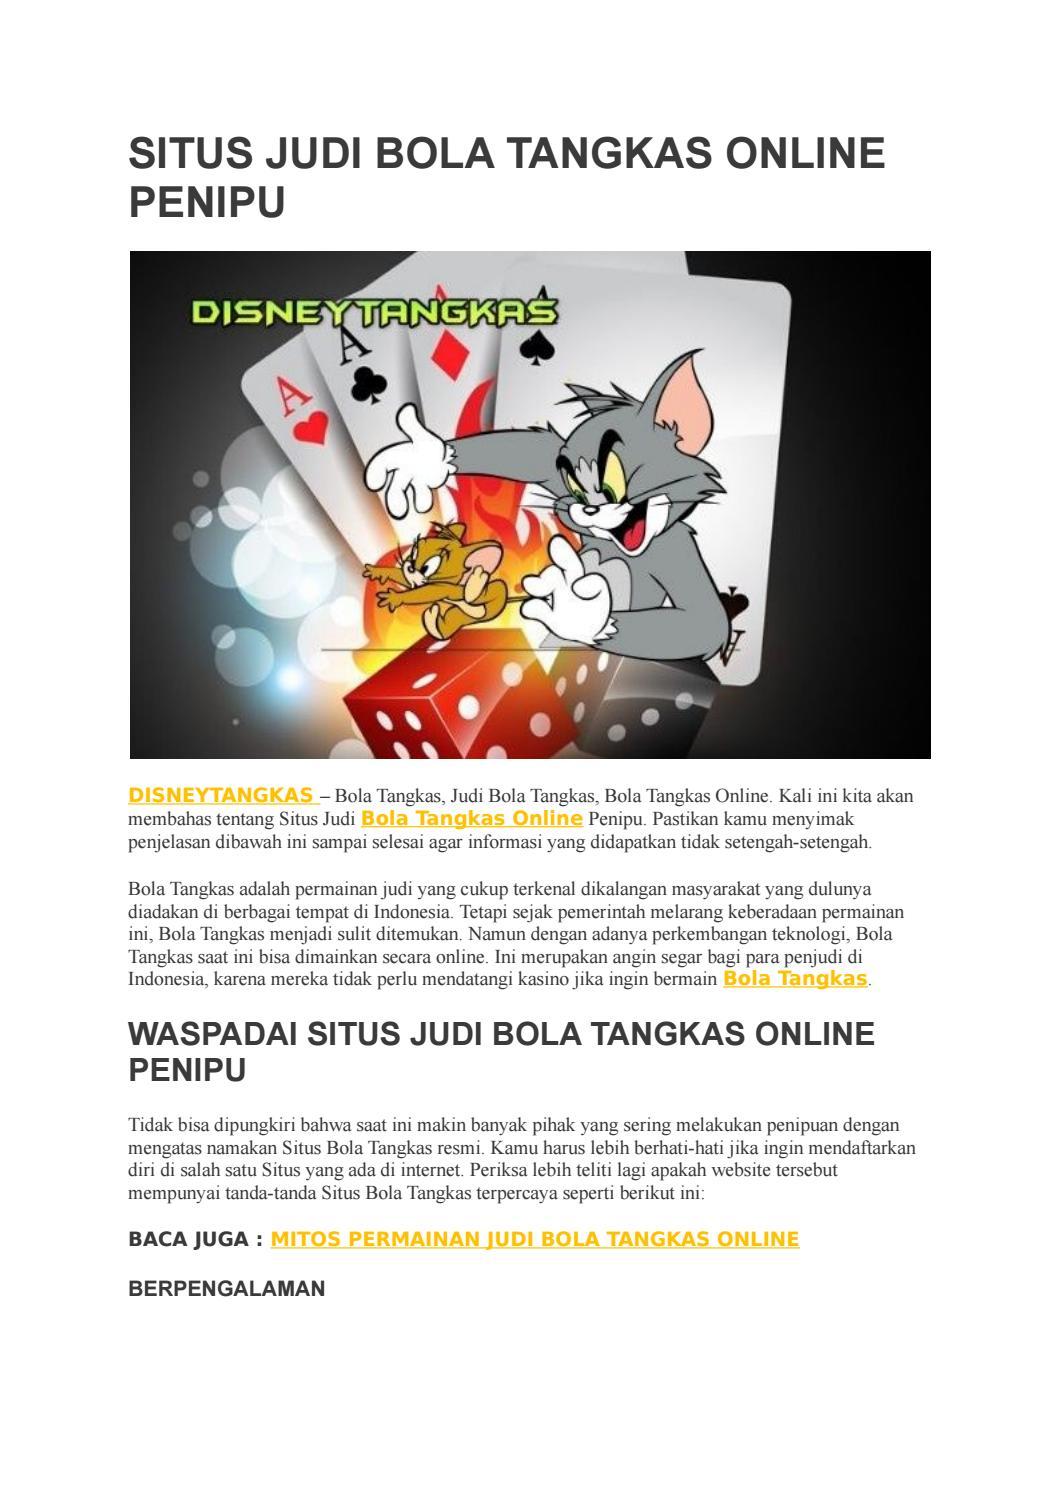 Situs Judi Bola Tangkas Online Penipu By Disneytangkas Issuu